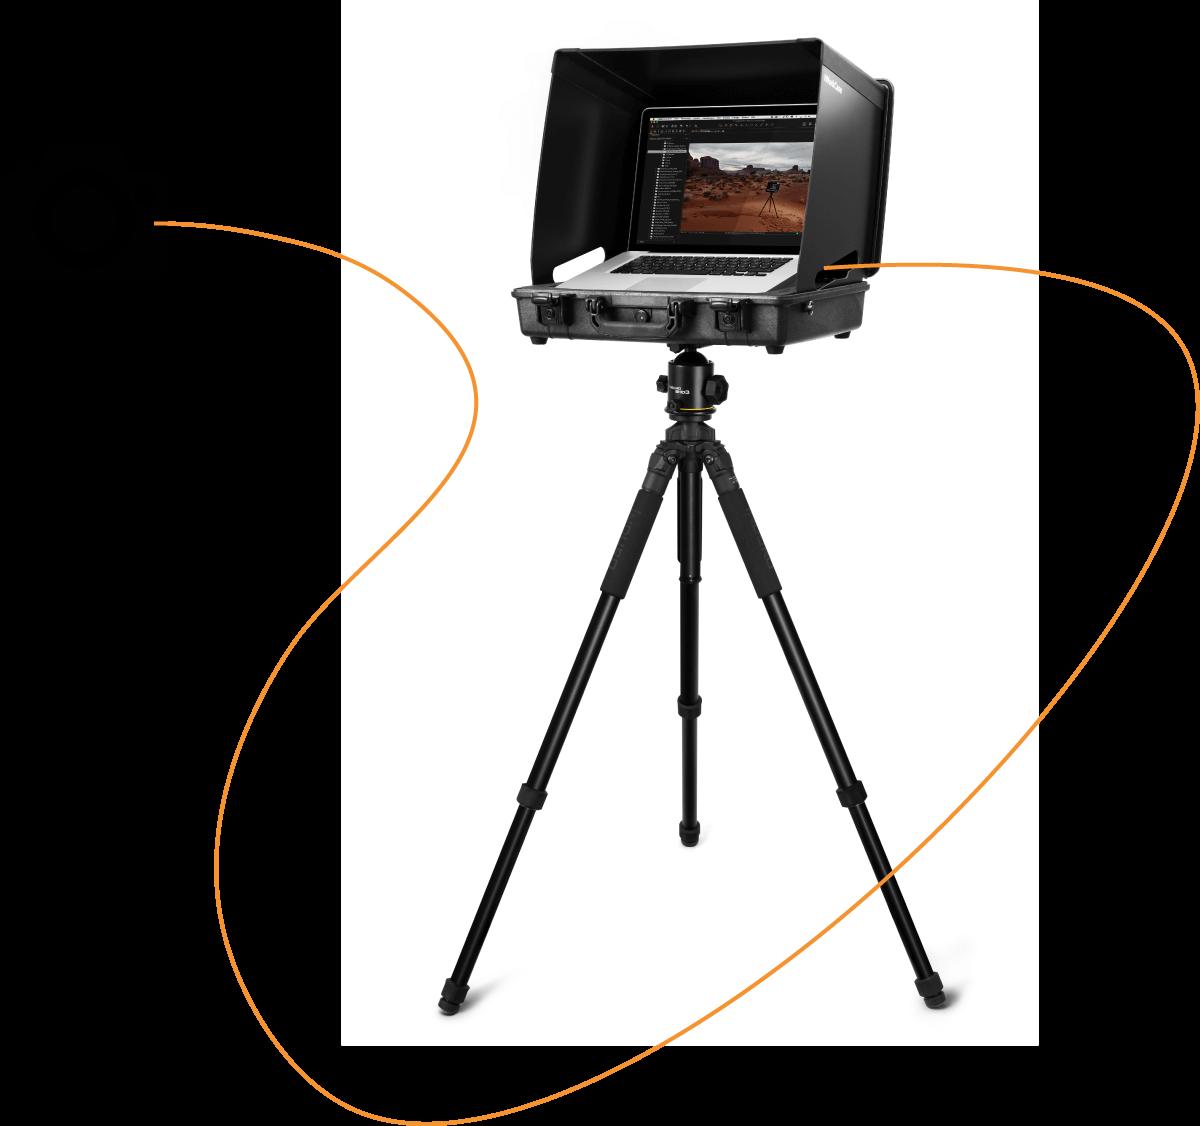 iworkcase digicase on tripod with camera tethered